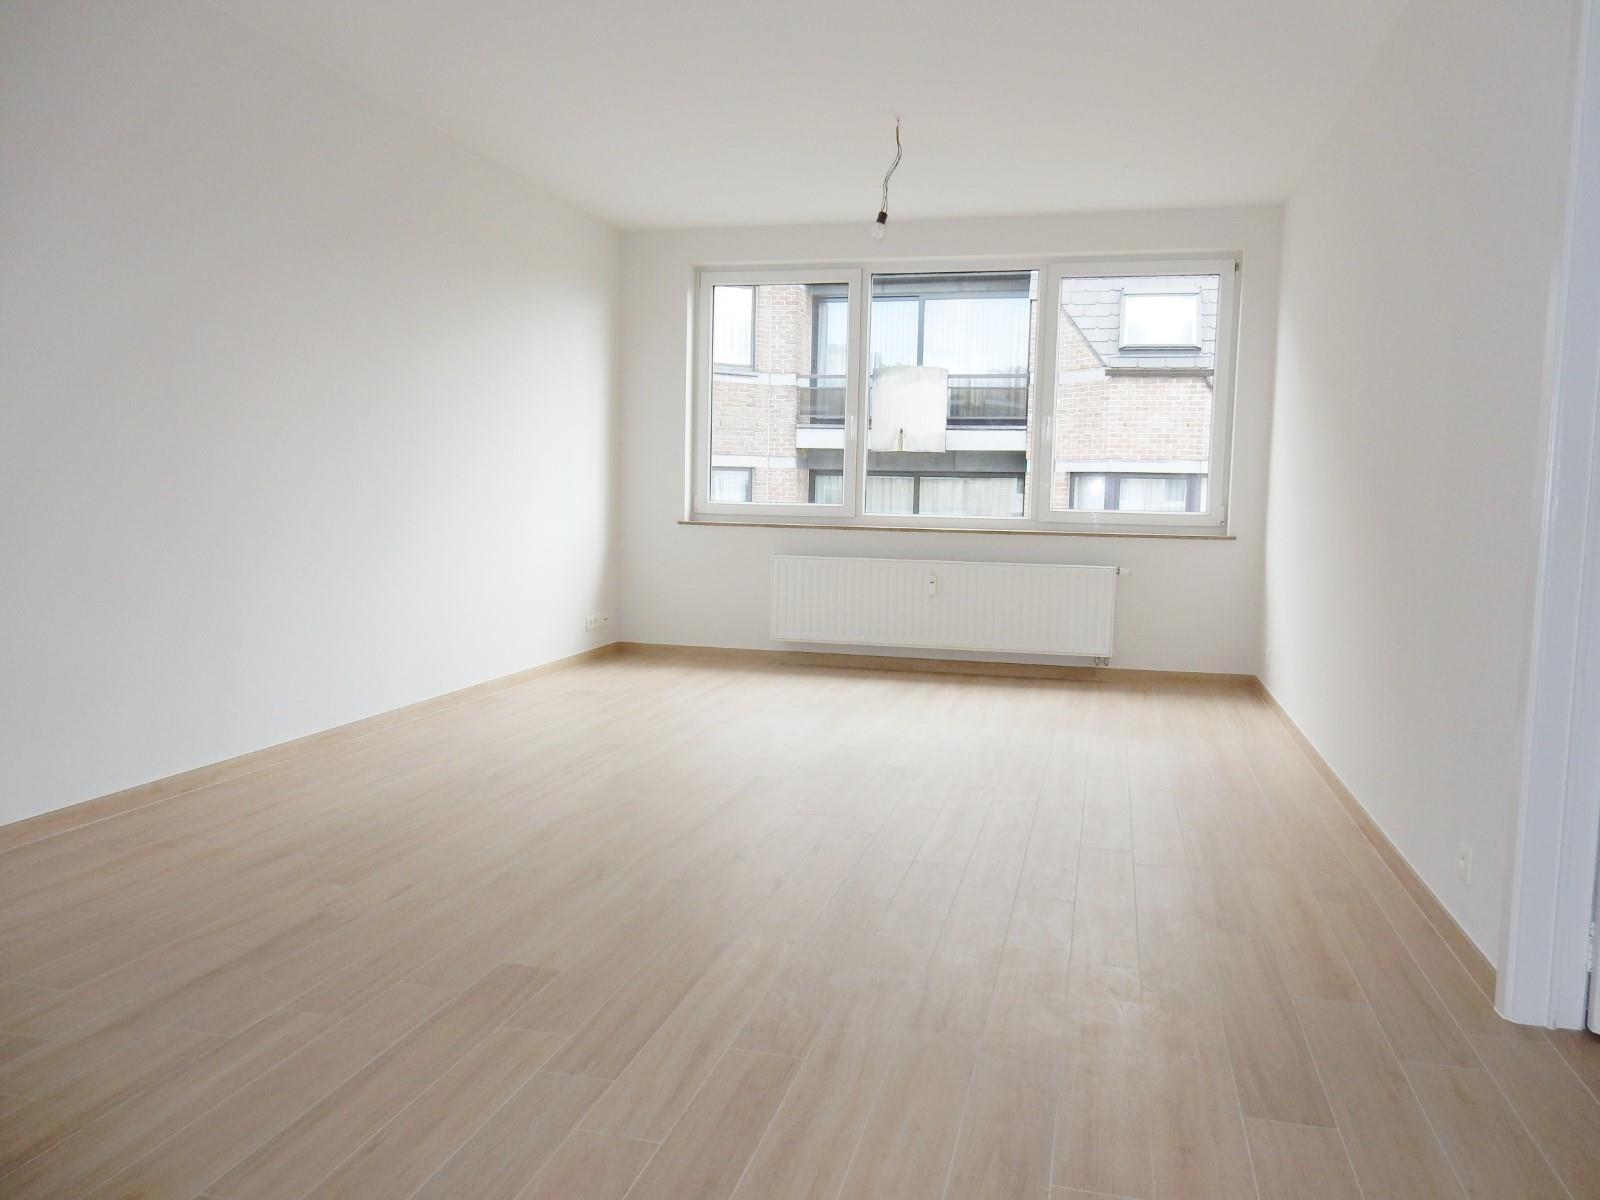 Appartement - Auderghem - #3729581-0